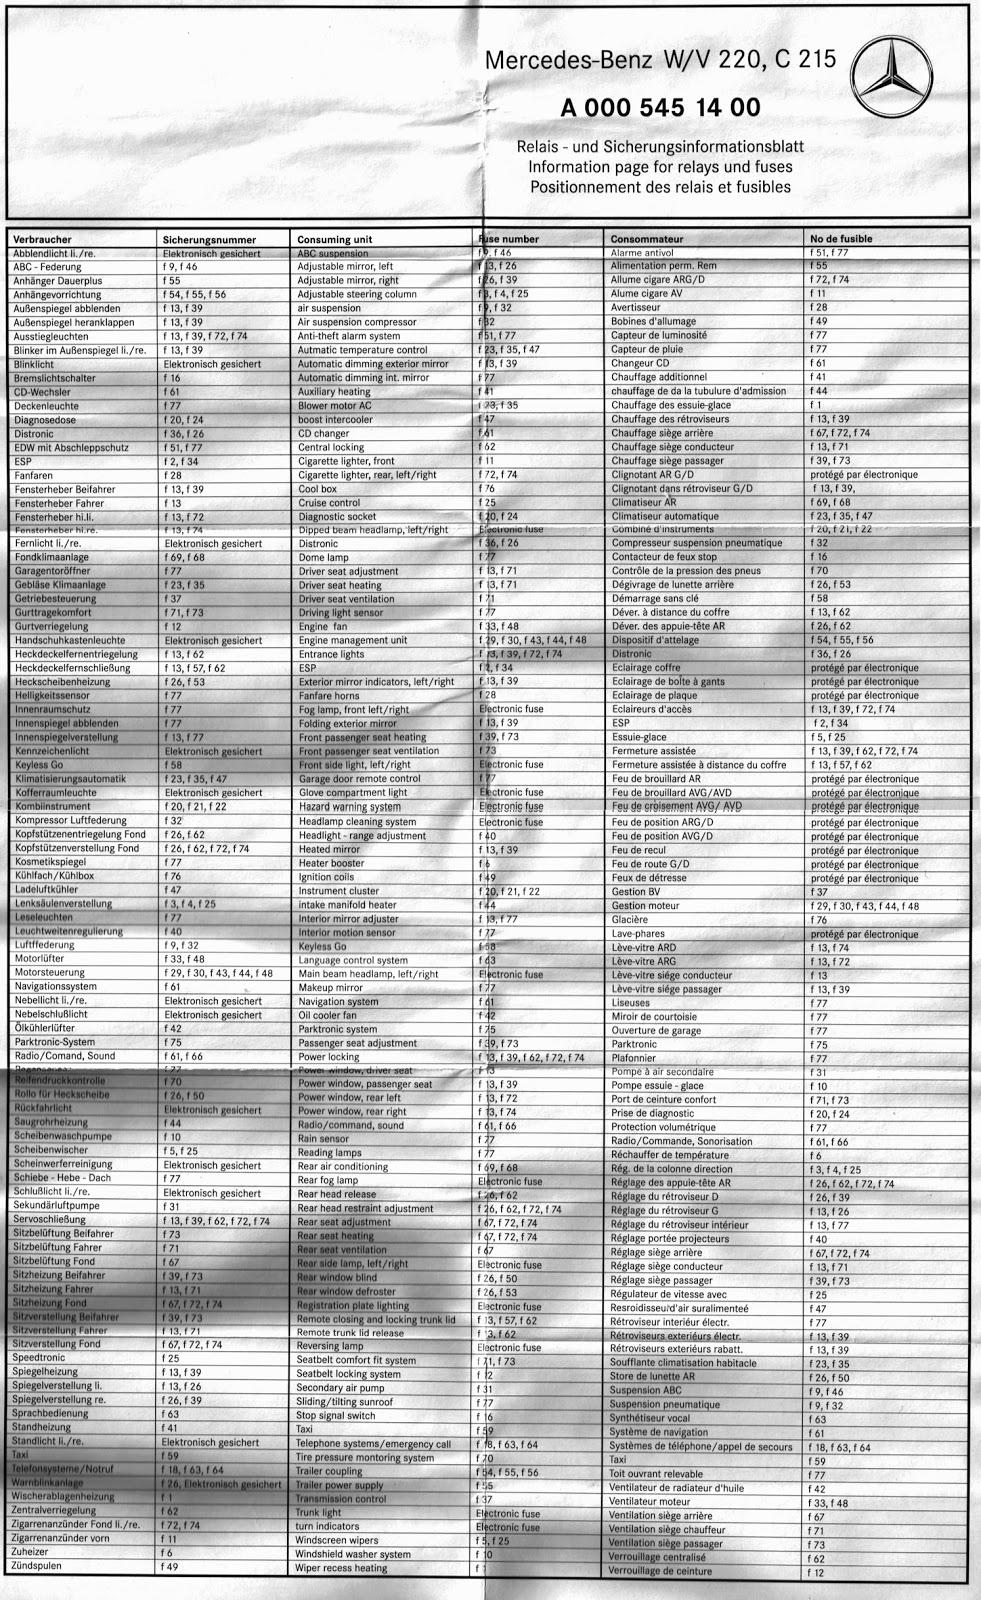 fuse box chart 2000 s430 mercedes nm 7110  2000 mercedes benz s500 fuse box diagram wiring diagram  nm 7110  2000 mercedes benz s500 fuse